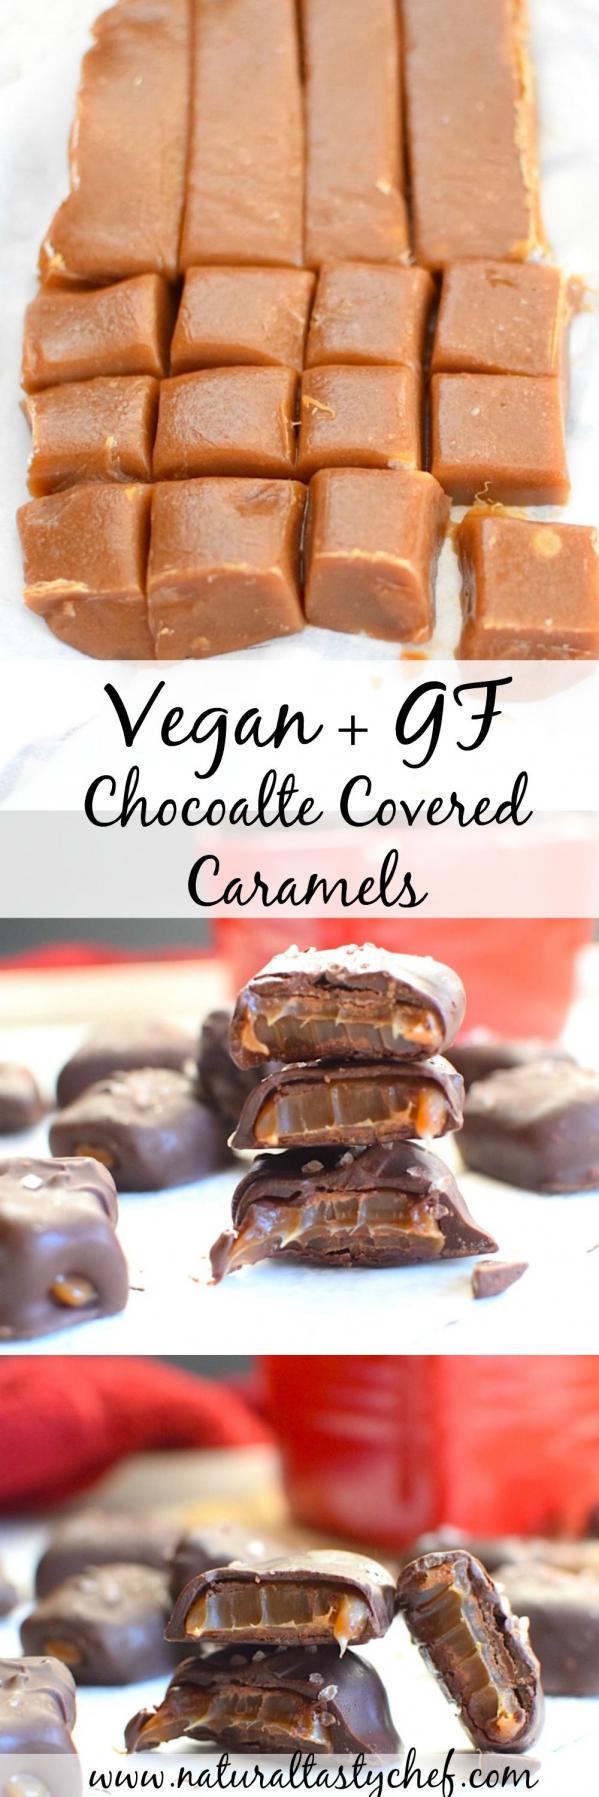 Vegan And Gluten Free Chocolate Covered Caramels Paleodessert In 2020 Vegan Dessert Recipes Vegan Desserts Vegan Candies